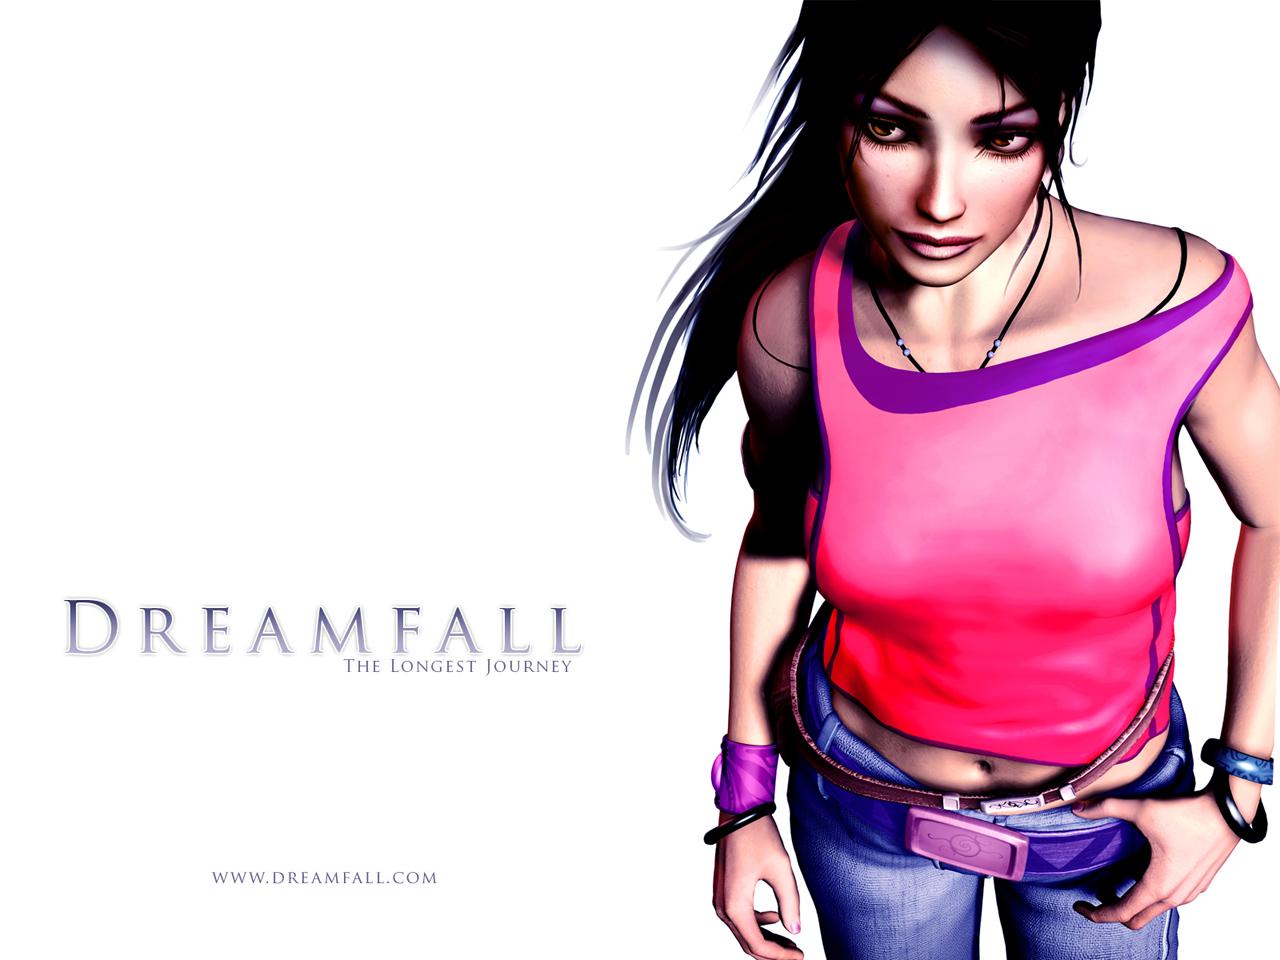 Dreamfall nude zoe mod textmod nude images